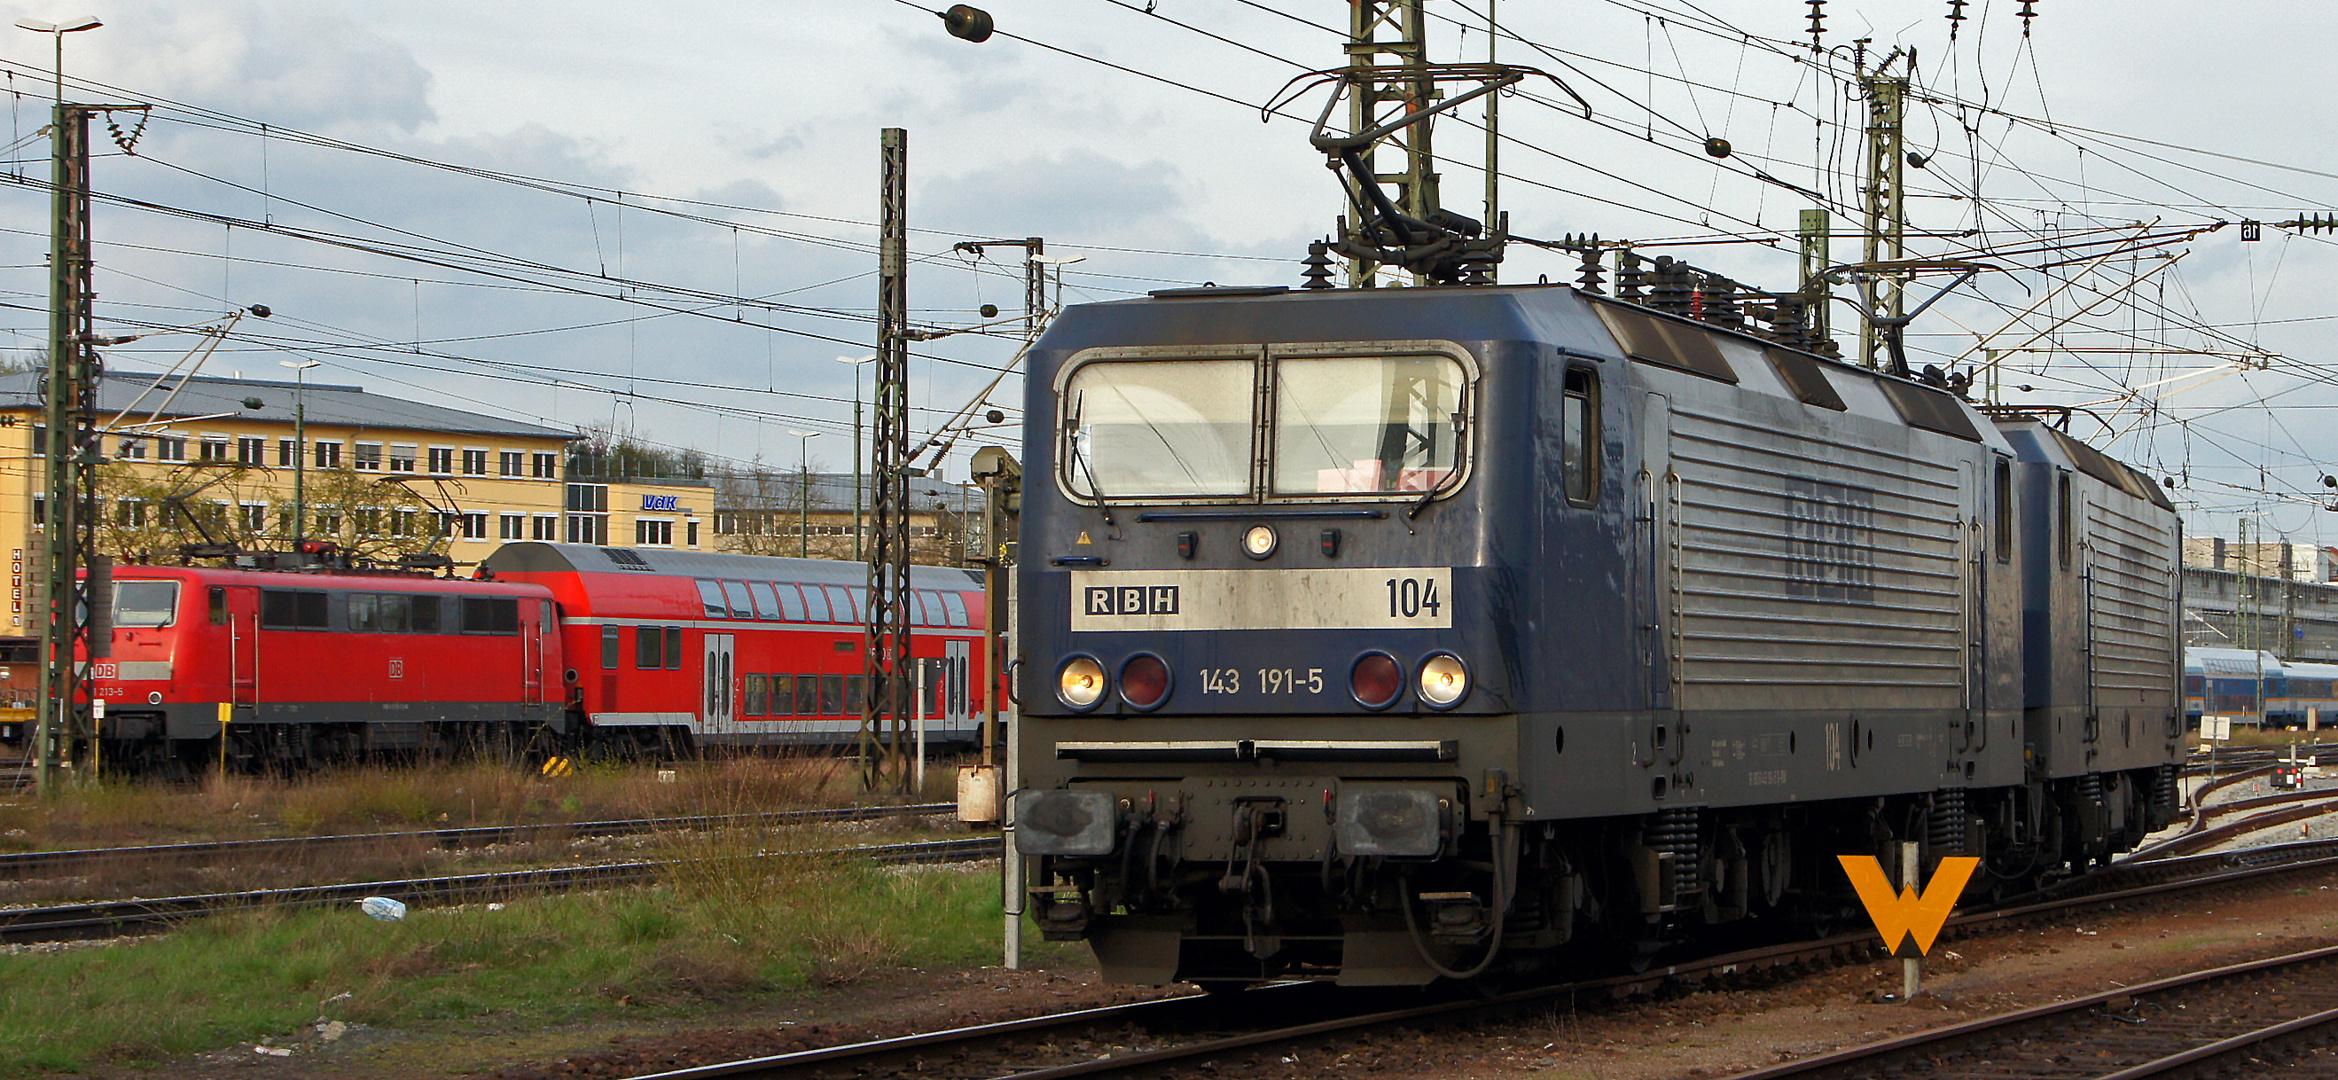 RBH 104 & RBH 110